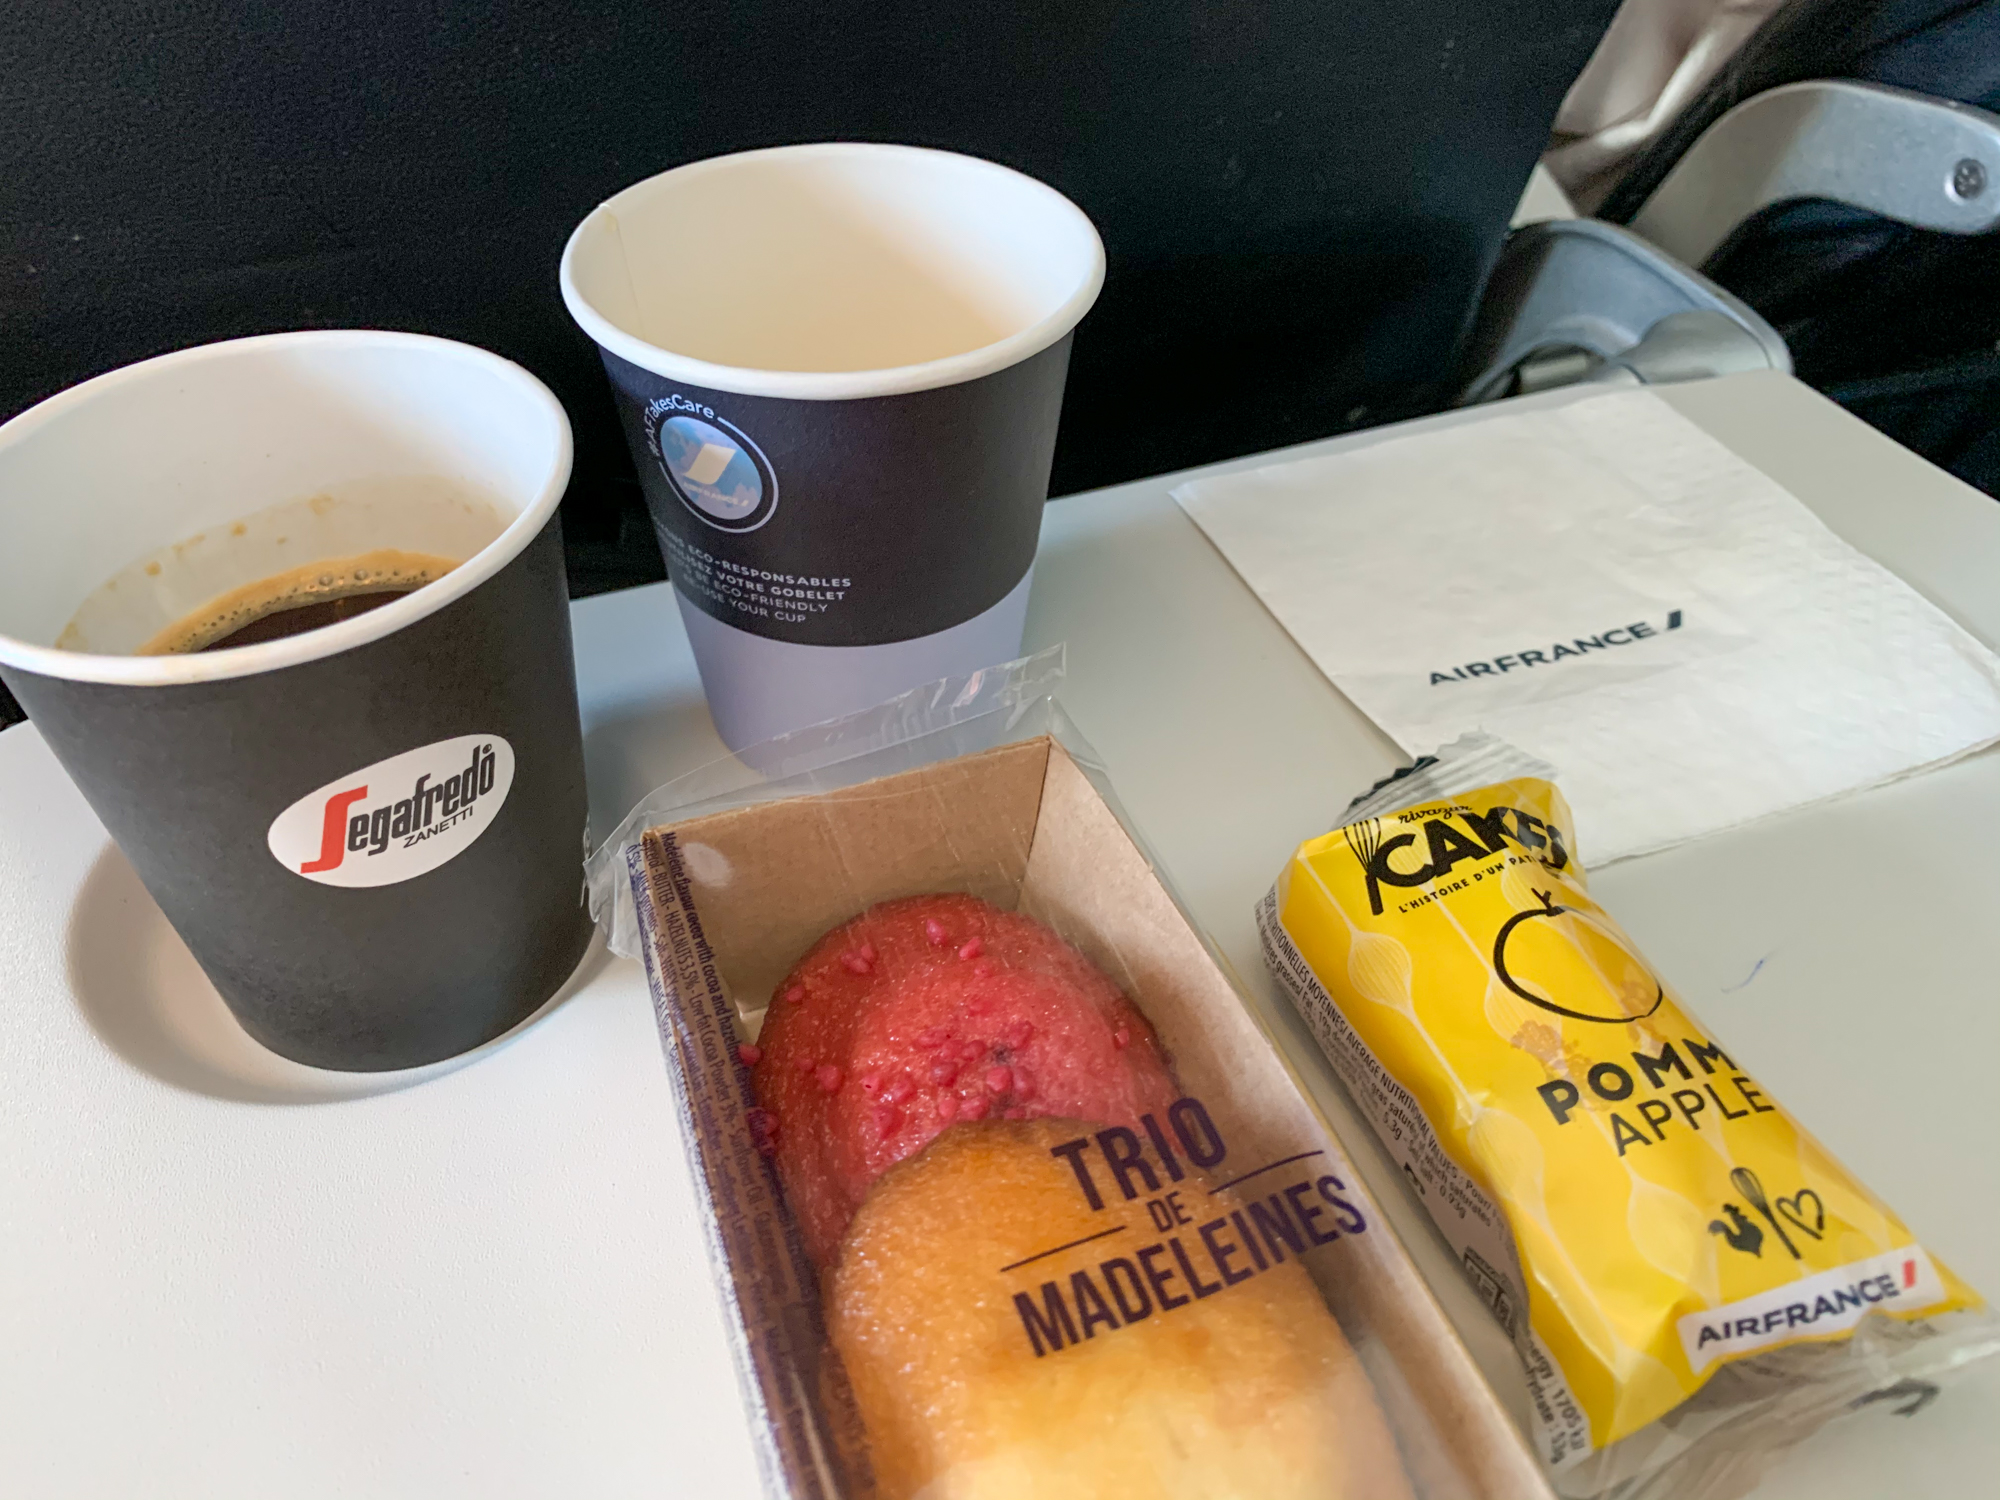 Air France breakfast service